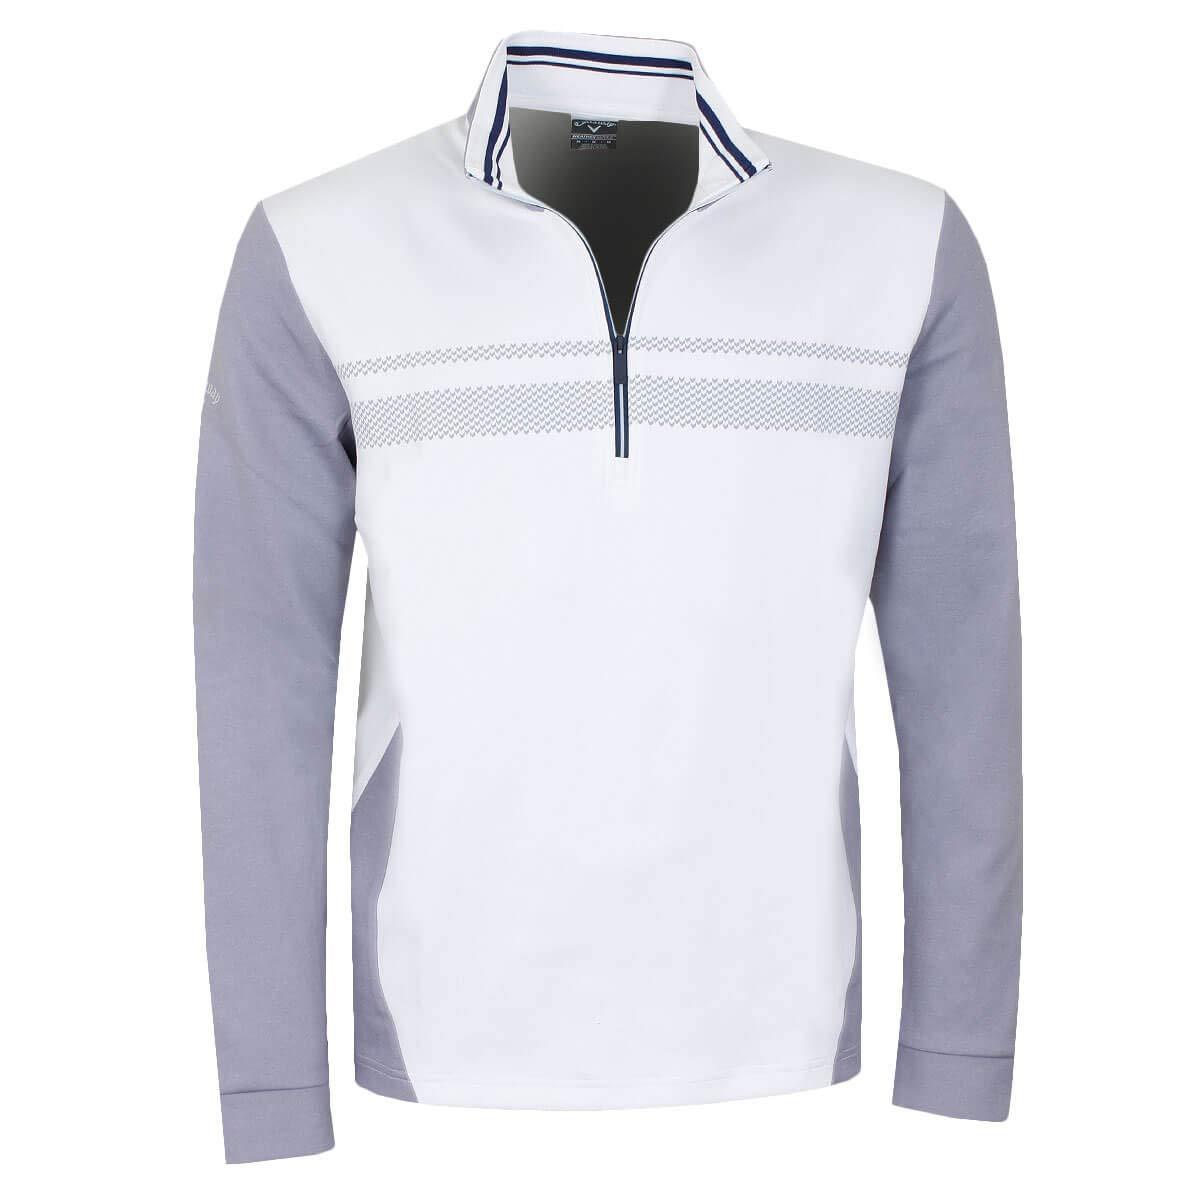 Callaway Golf 2019 Mens 1/4 Zip High Gauge Fleece Thermal Stretch Golf Pullover Bright White XL by Callaway